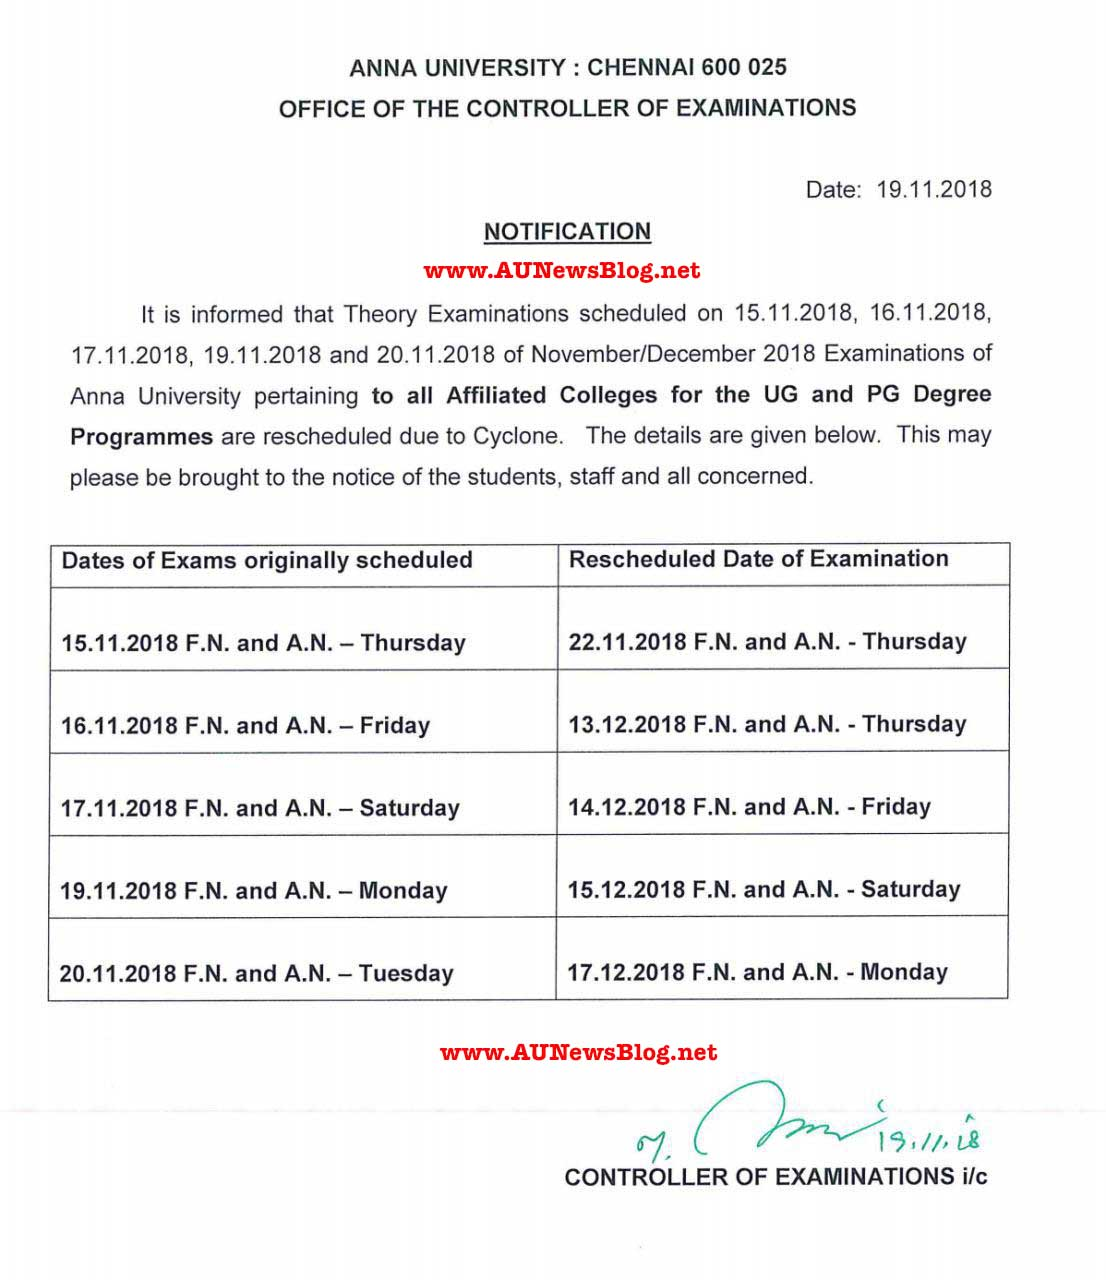 Anna University Nov Dec 2018 Exams Postponed & Rescheduled